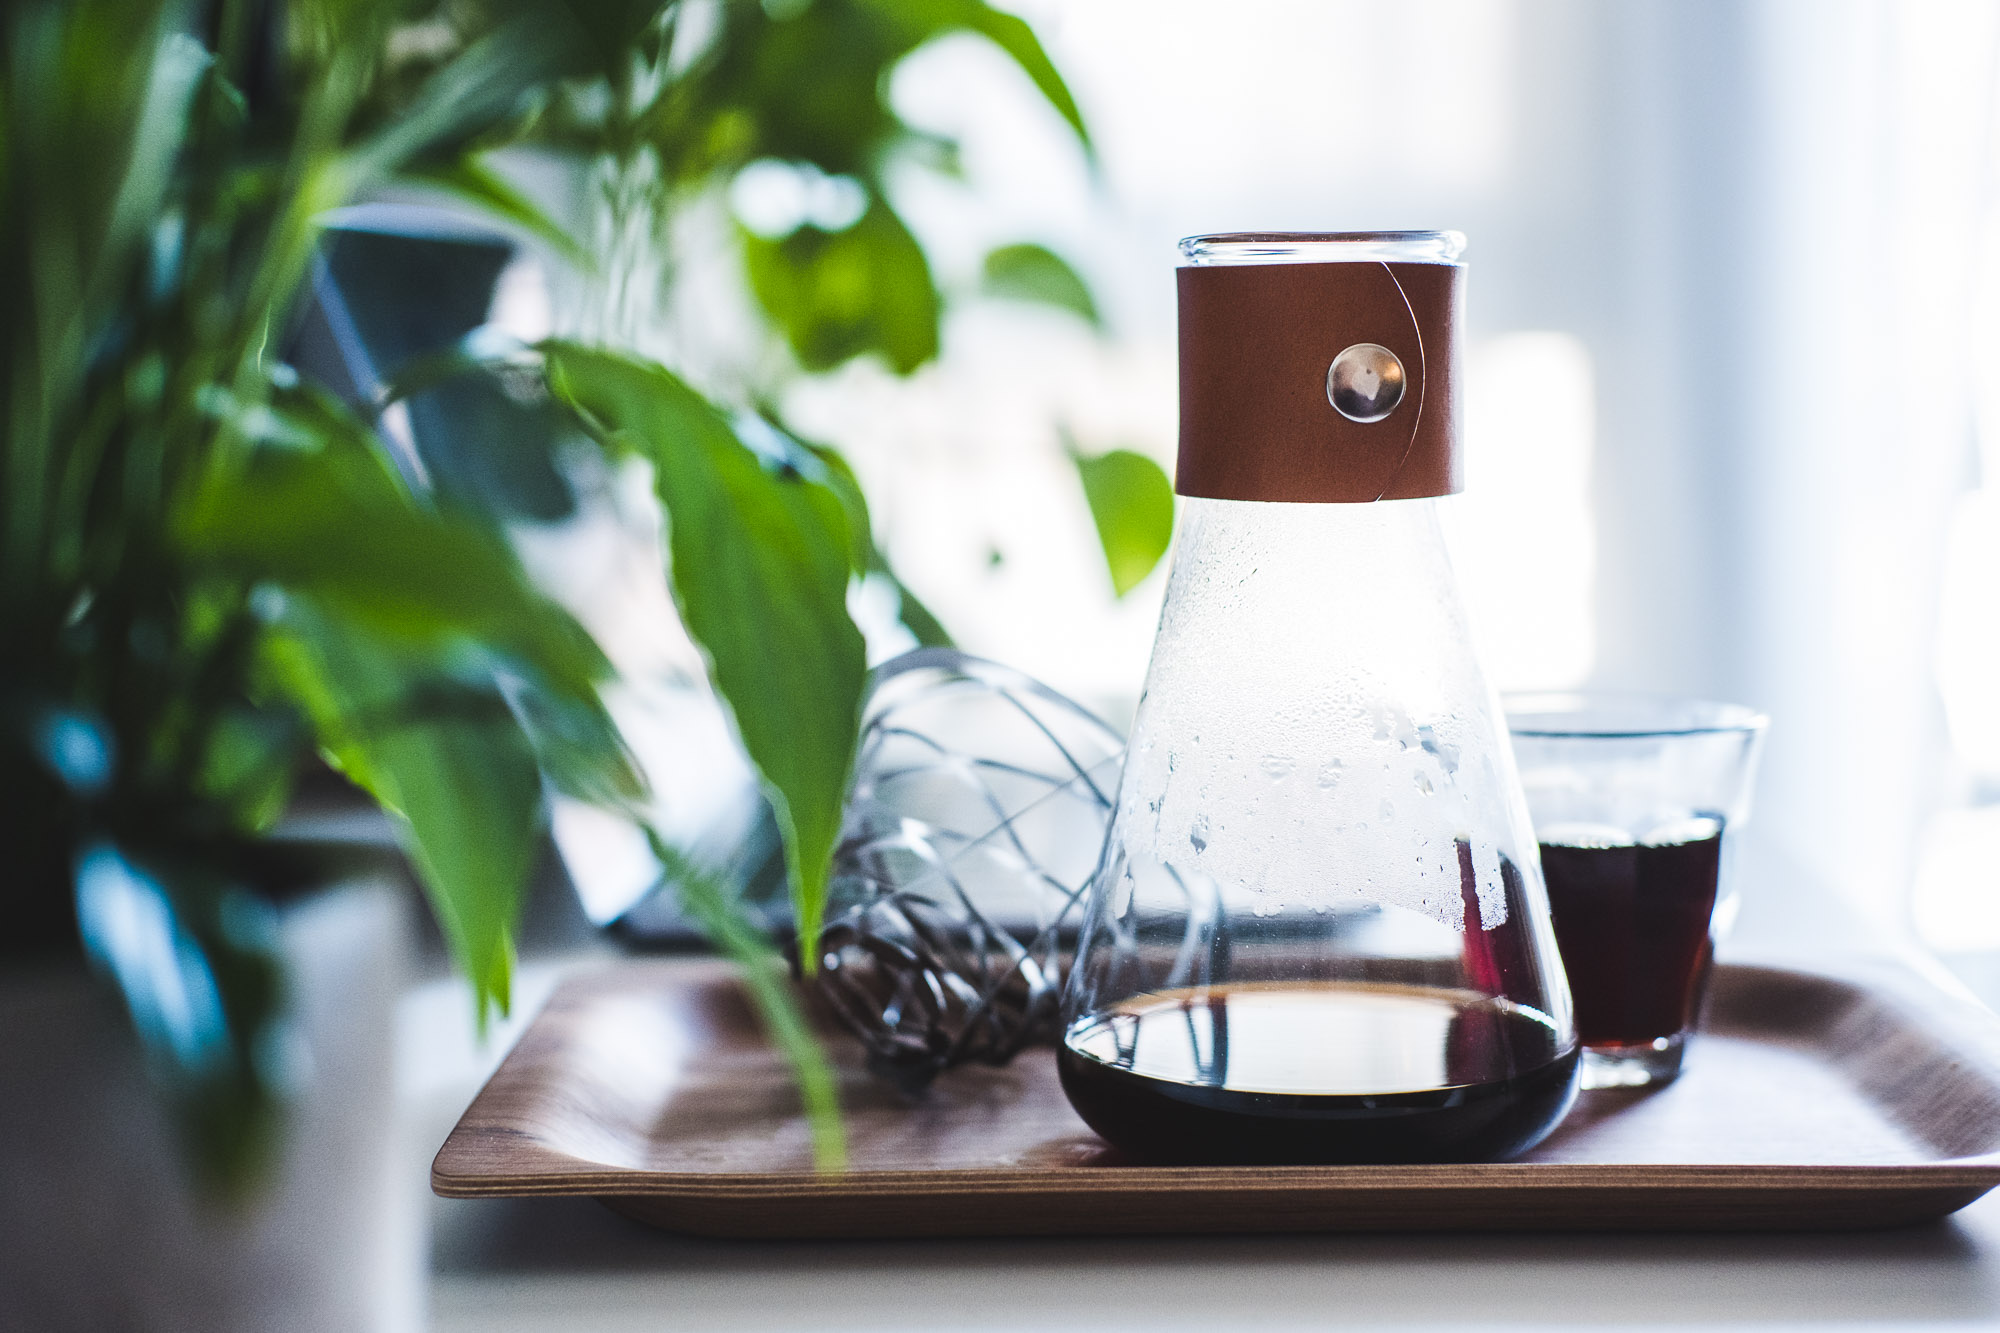 bairro-alto-coffee-brewer